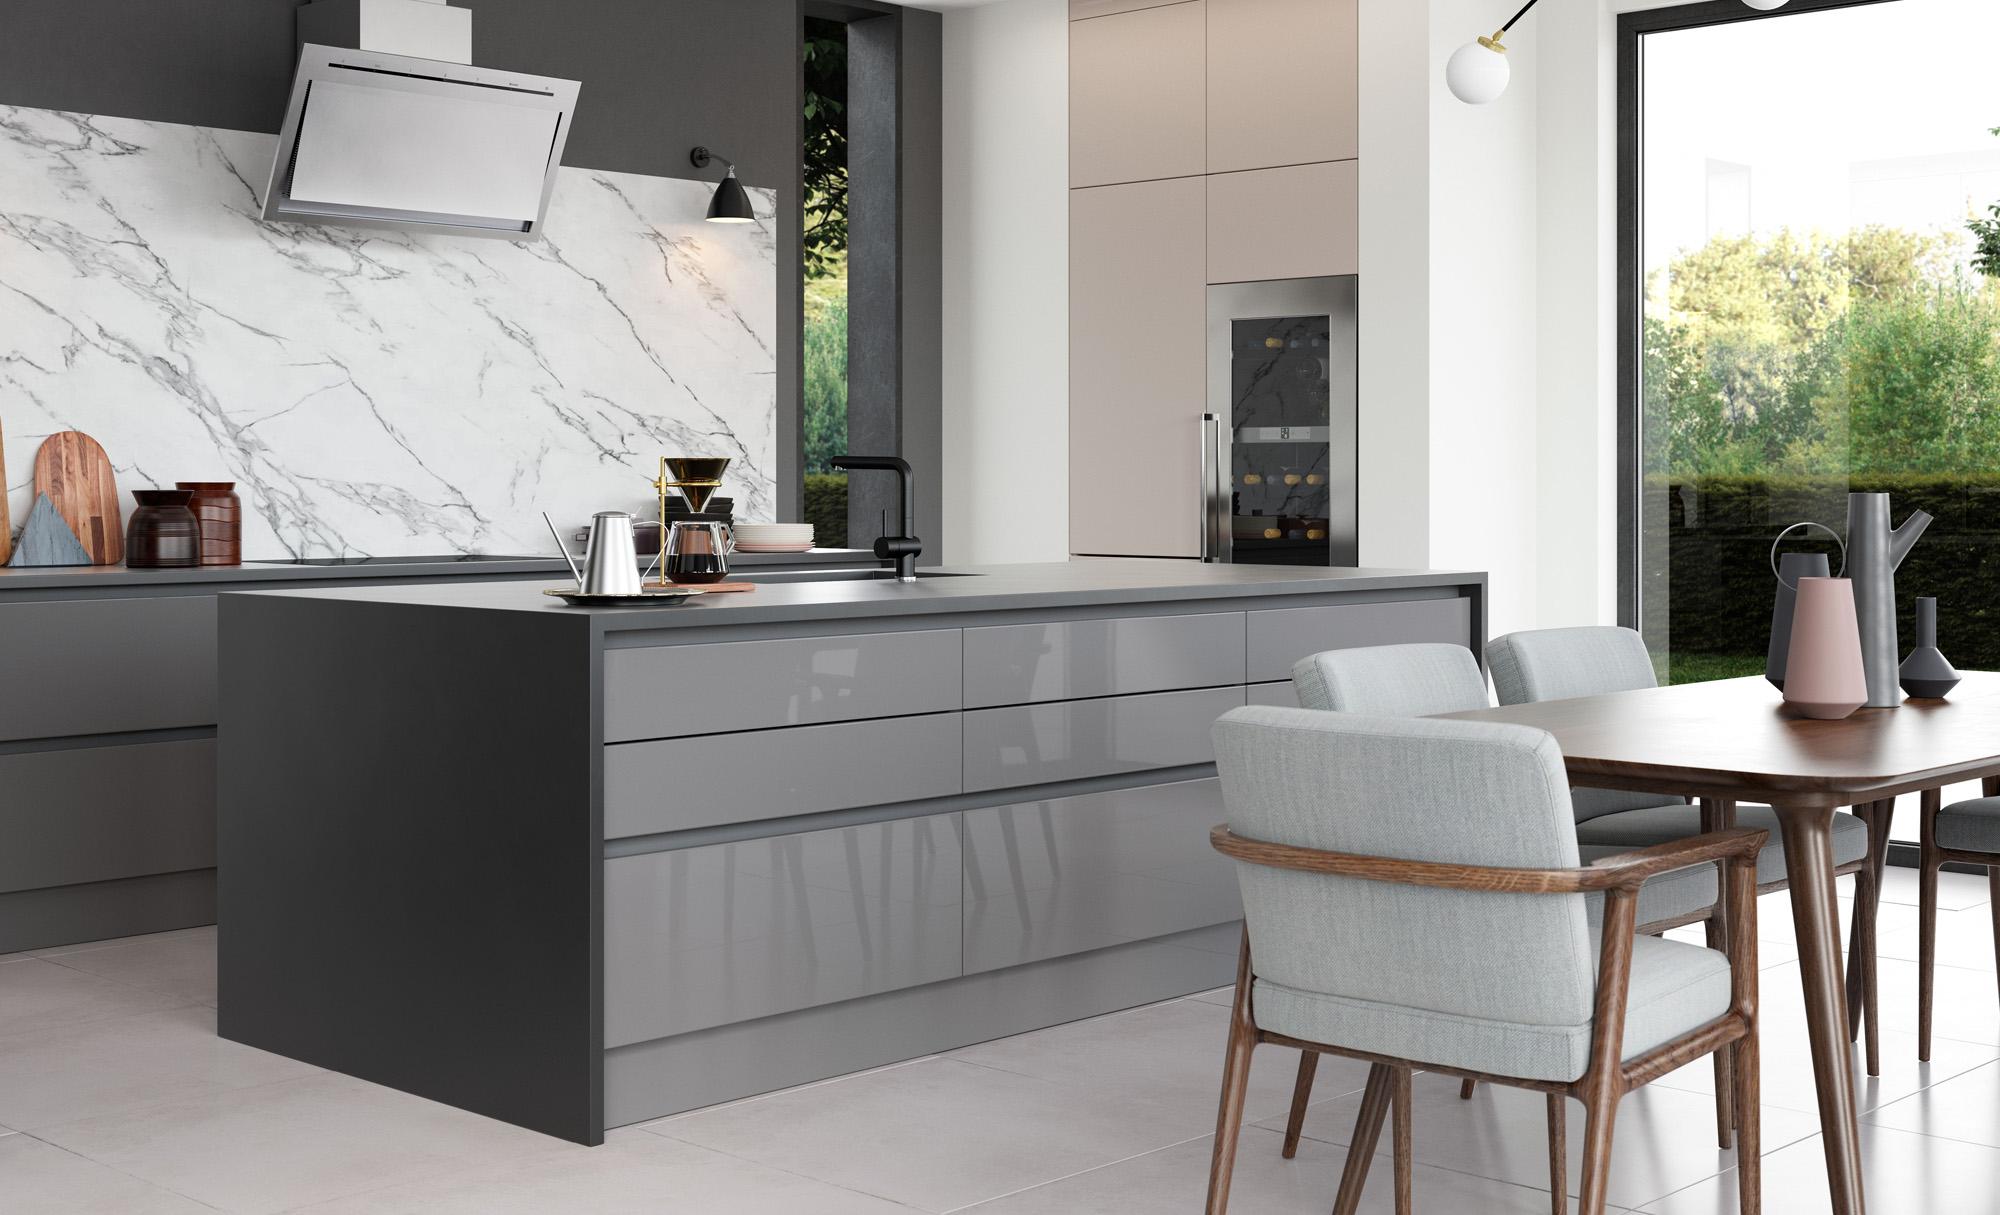 Modern Contemporary Tavola Stained Anthracite, Zola Gloss Dust Grey, Cashmere Kitchen - Kitchen Design - Alan Kelly Kitchens - Waterford